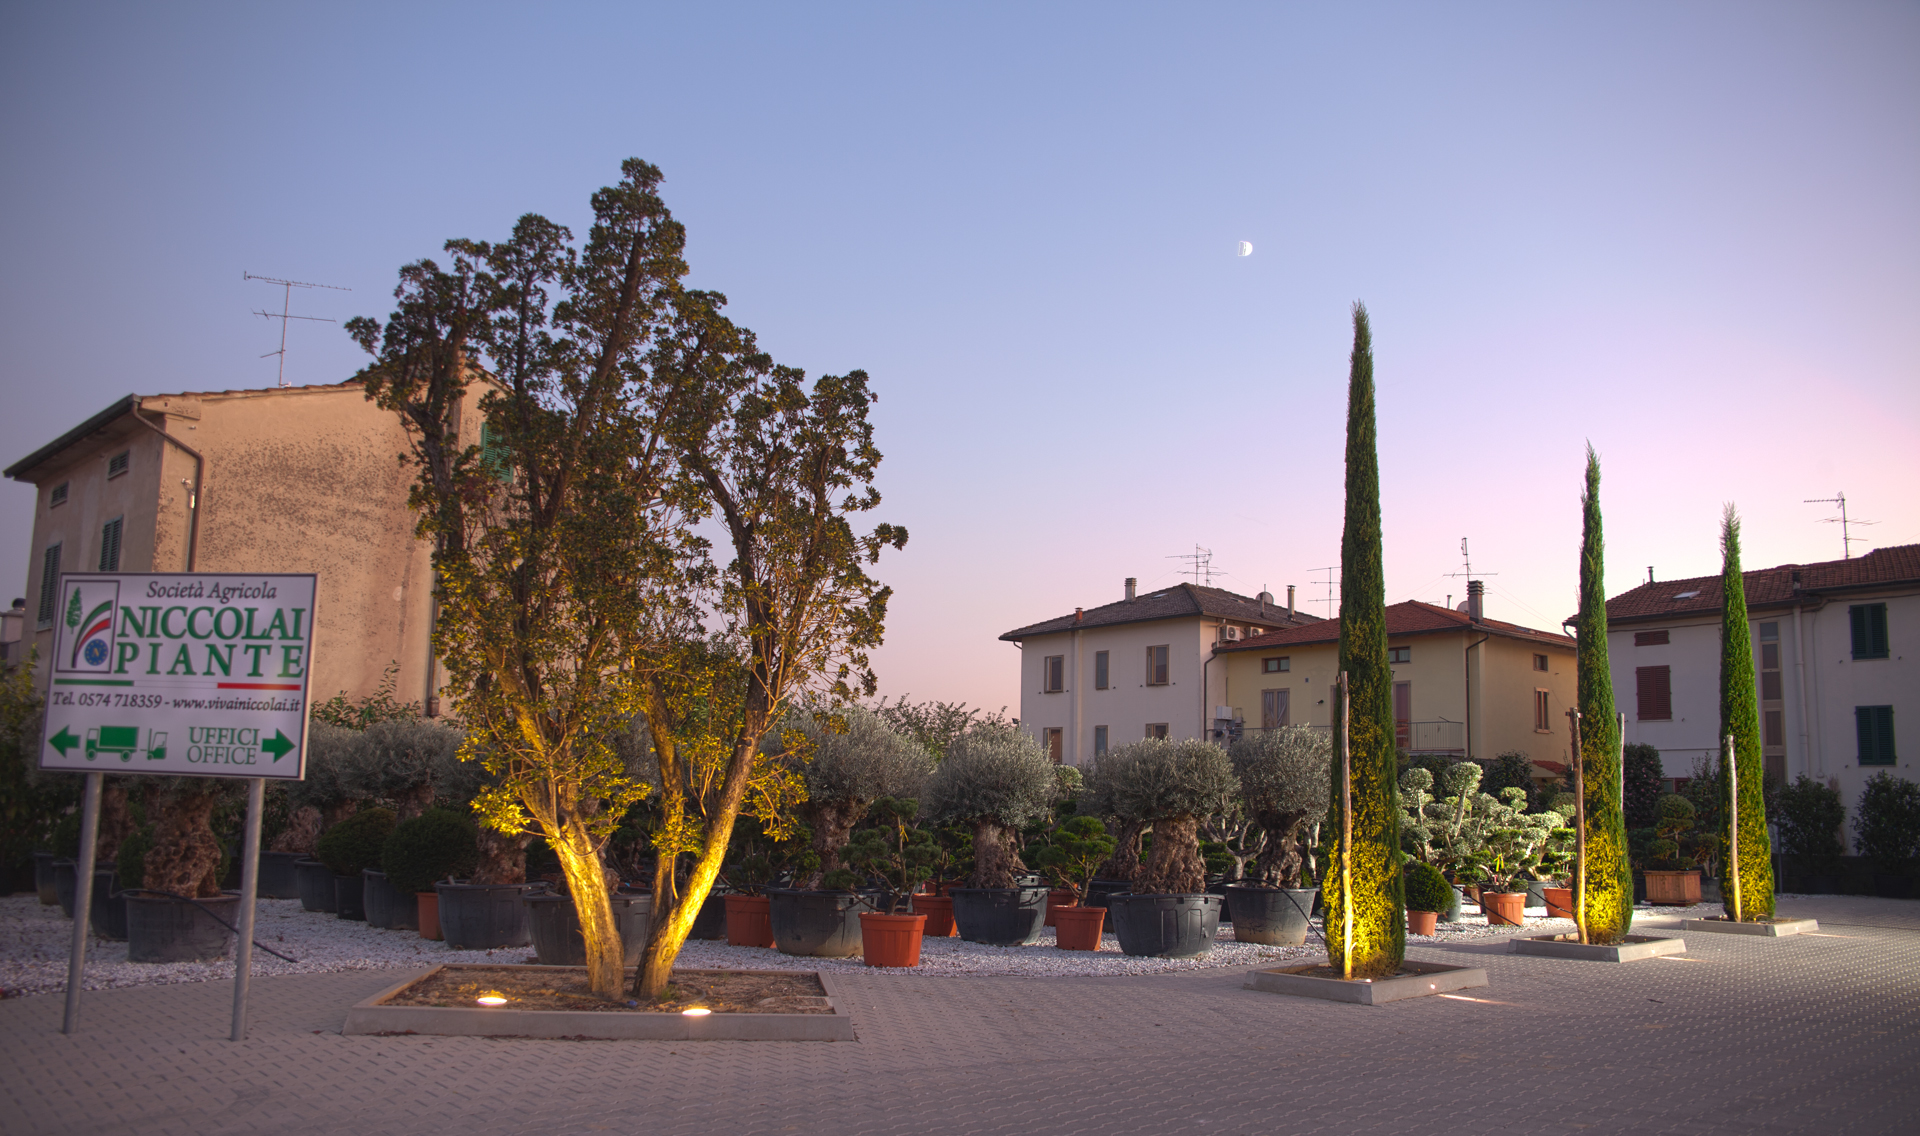 Niccolai Vivai – Fotografia professionale vivaistica